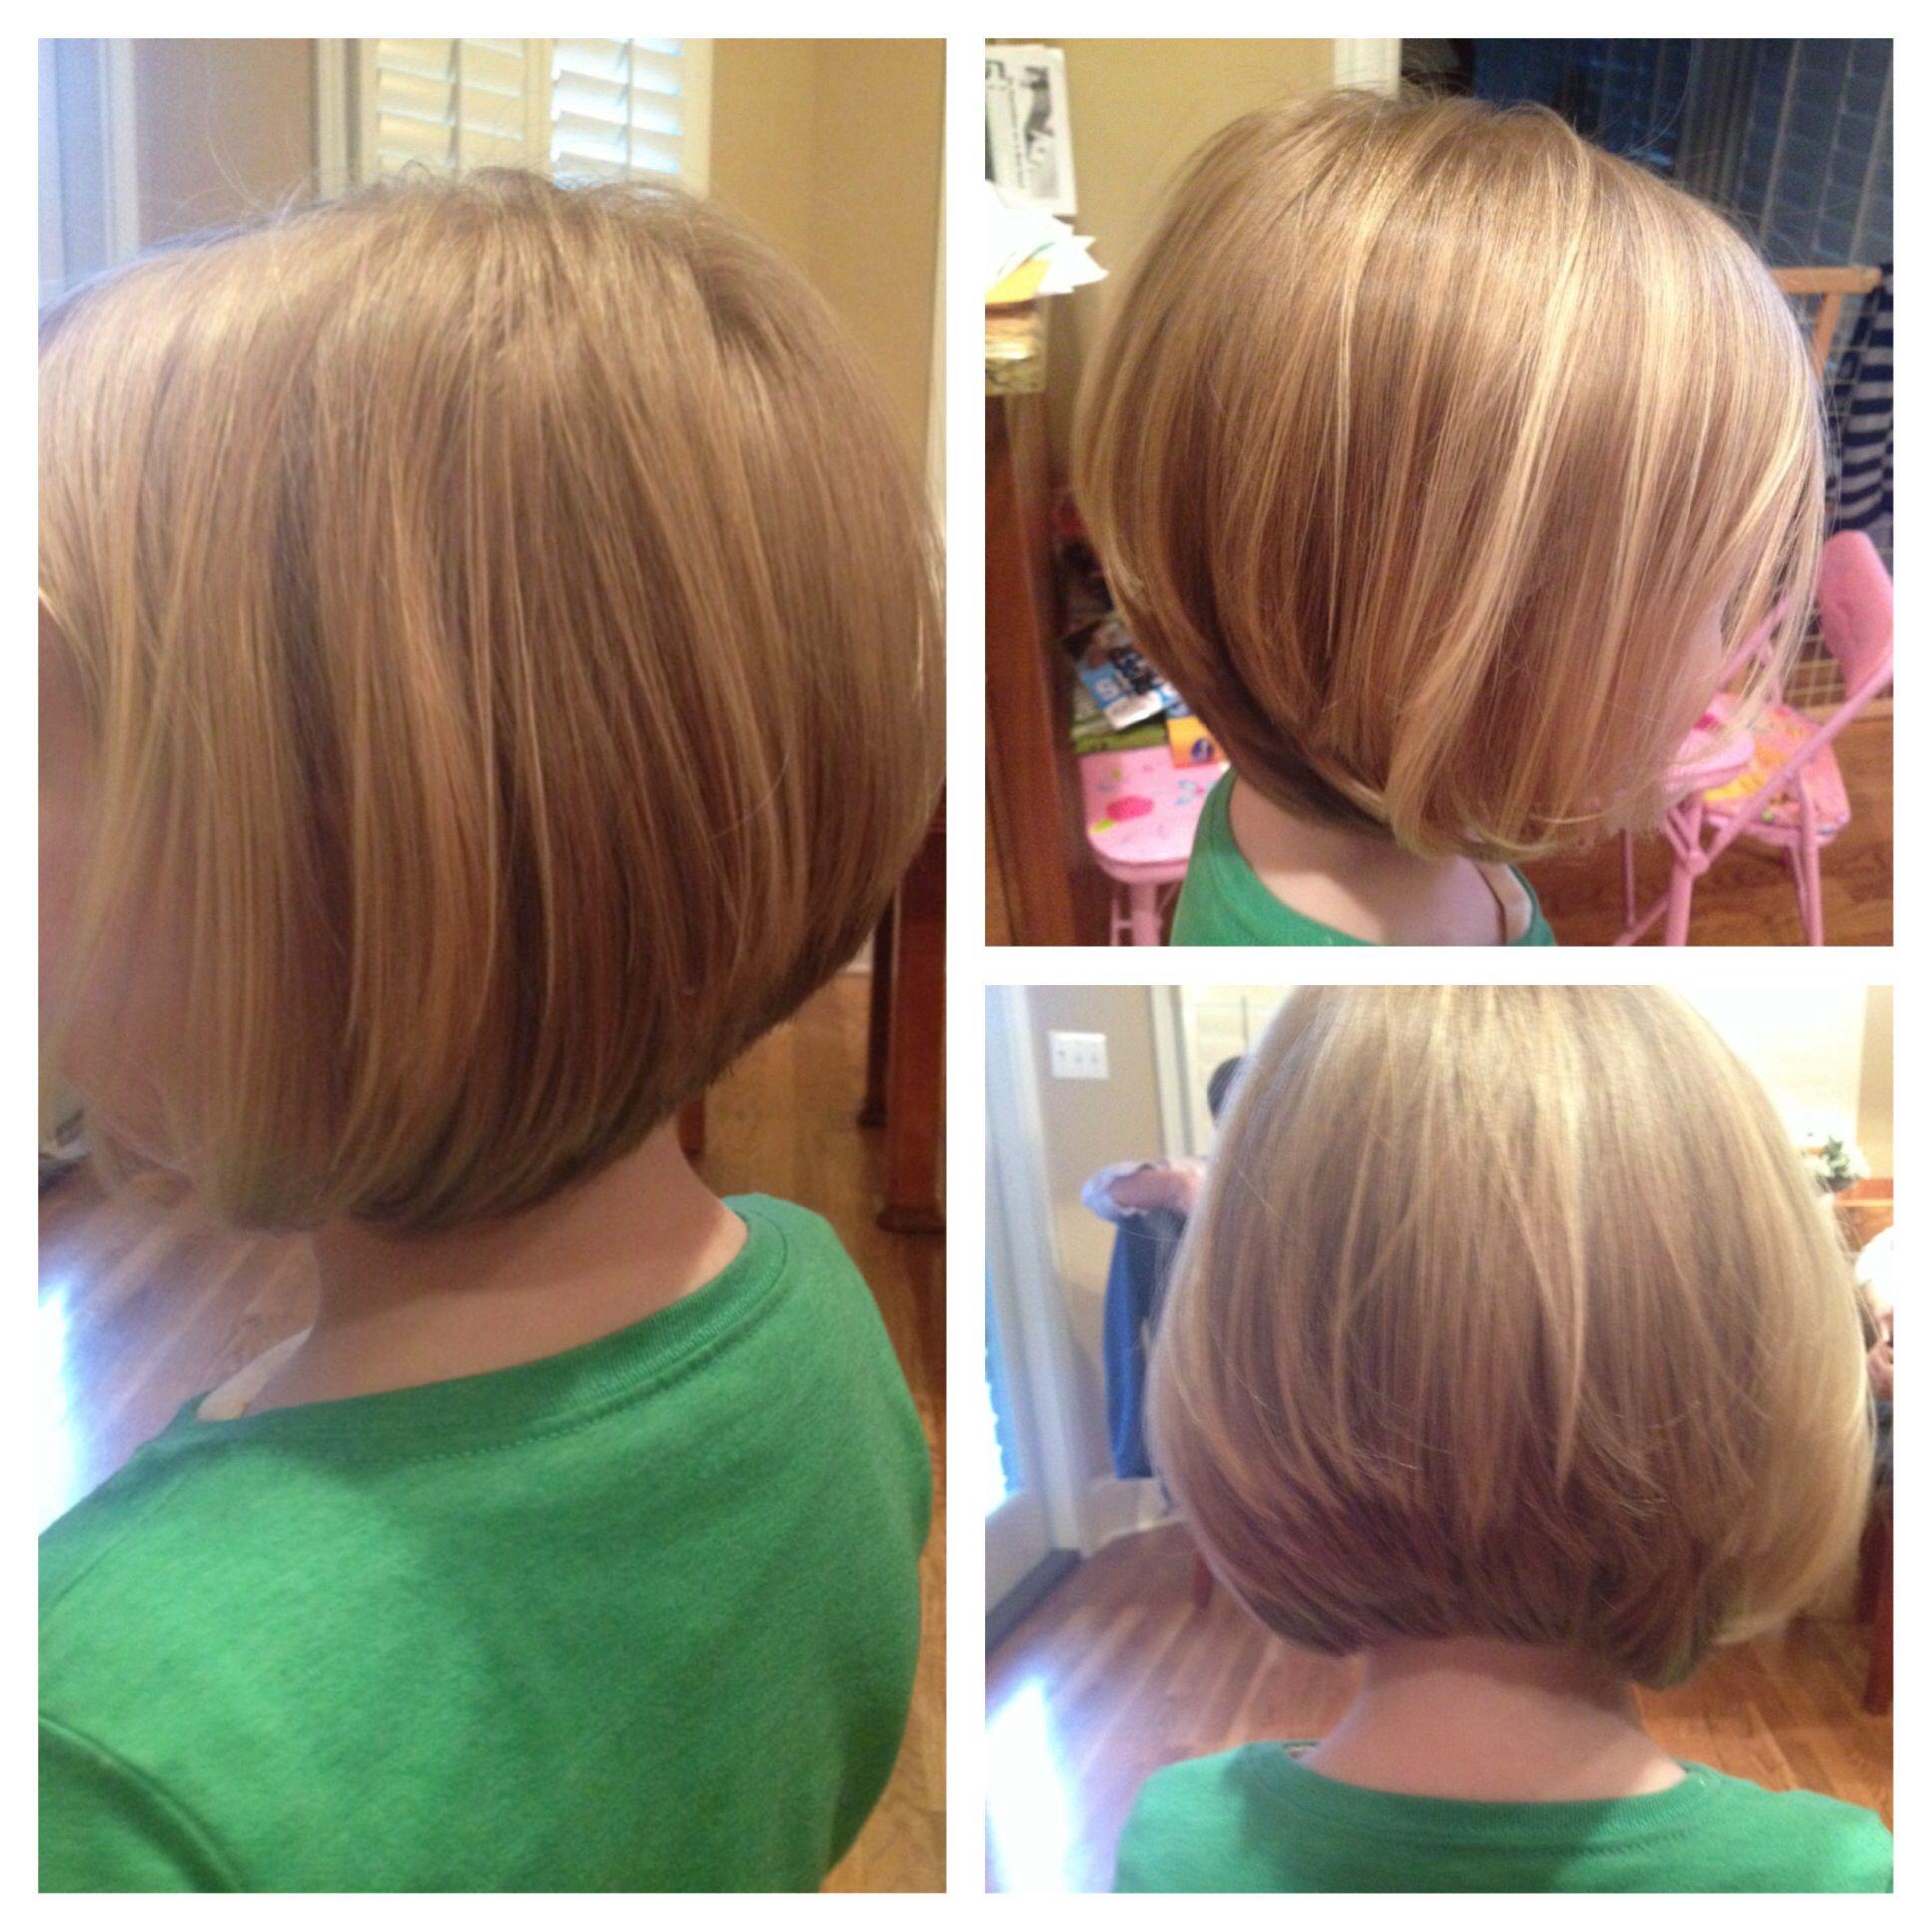 Pin By Kelli Patten On My Work Bob Hairstyles For Fine Hair Bob Haircut For Fine Hair Haircuts For Fine Hair